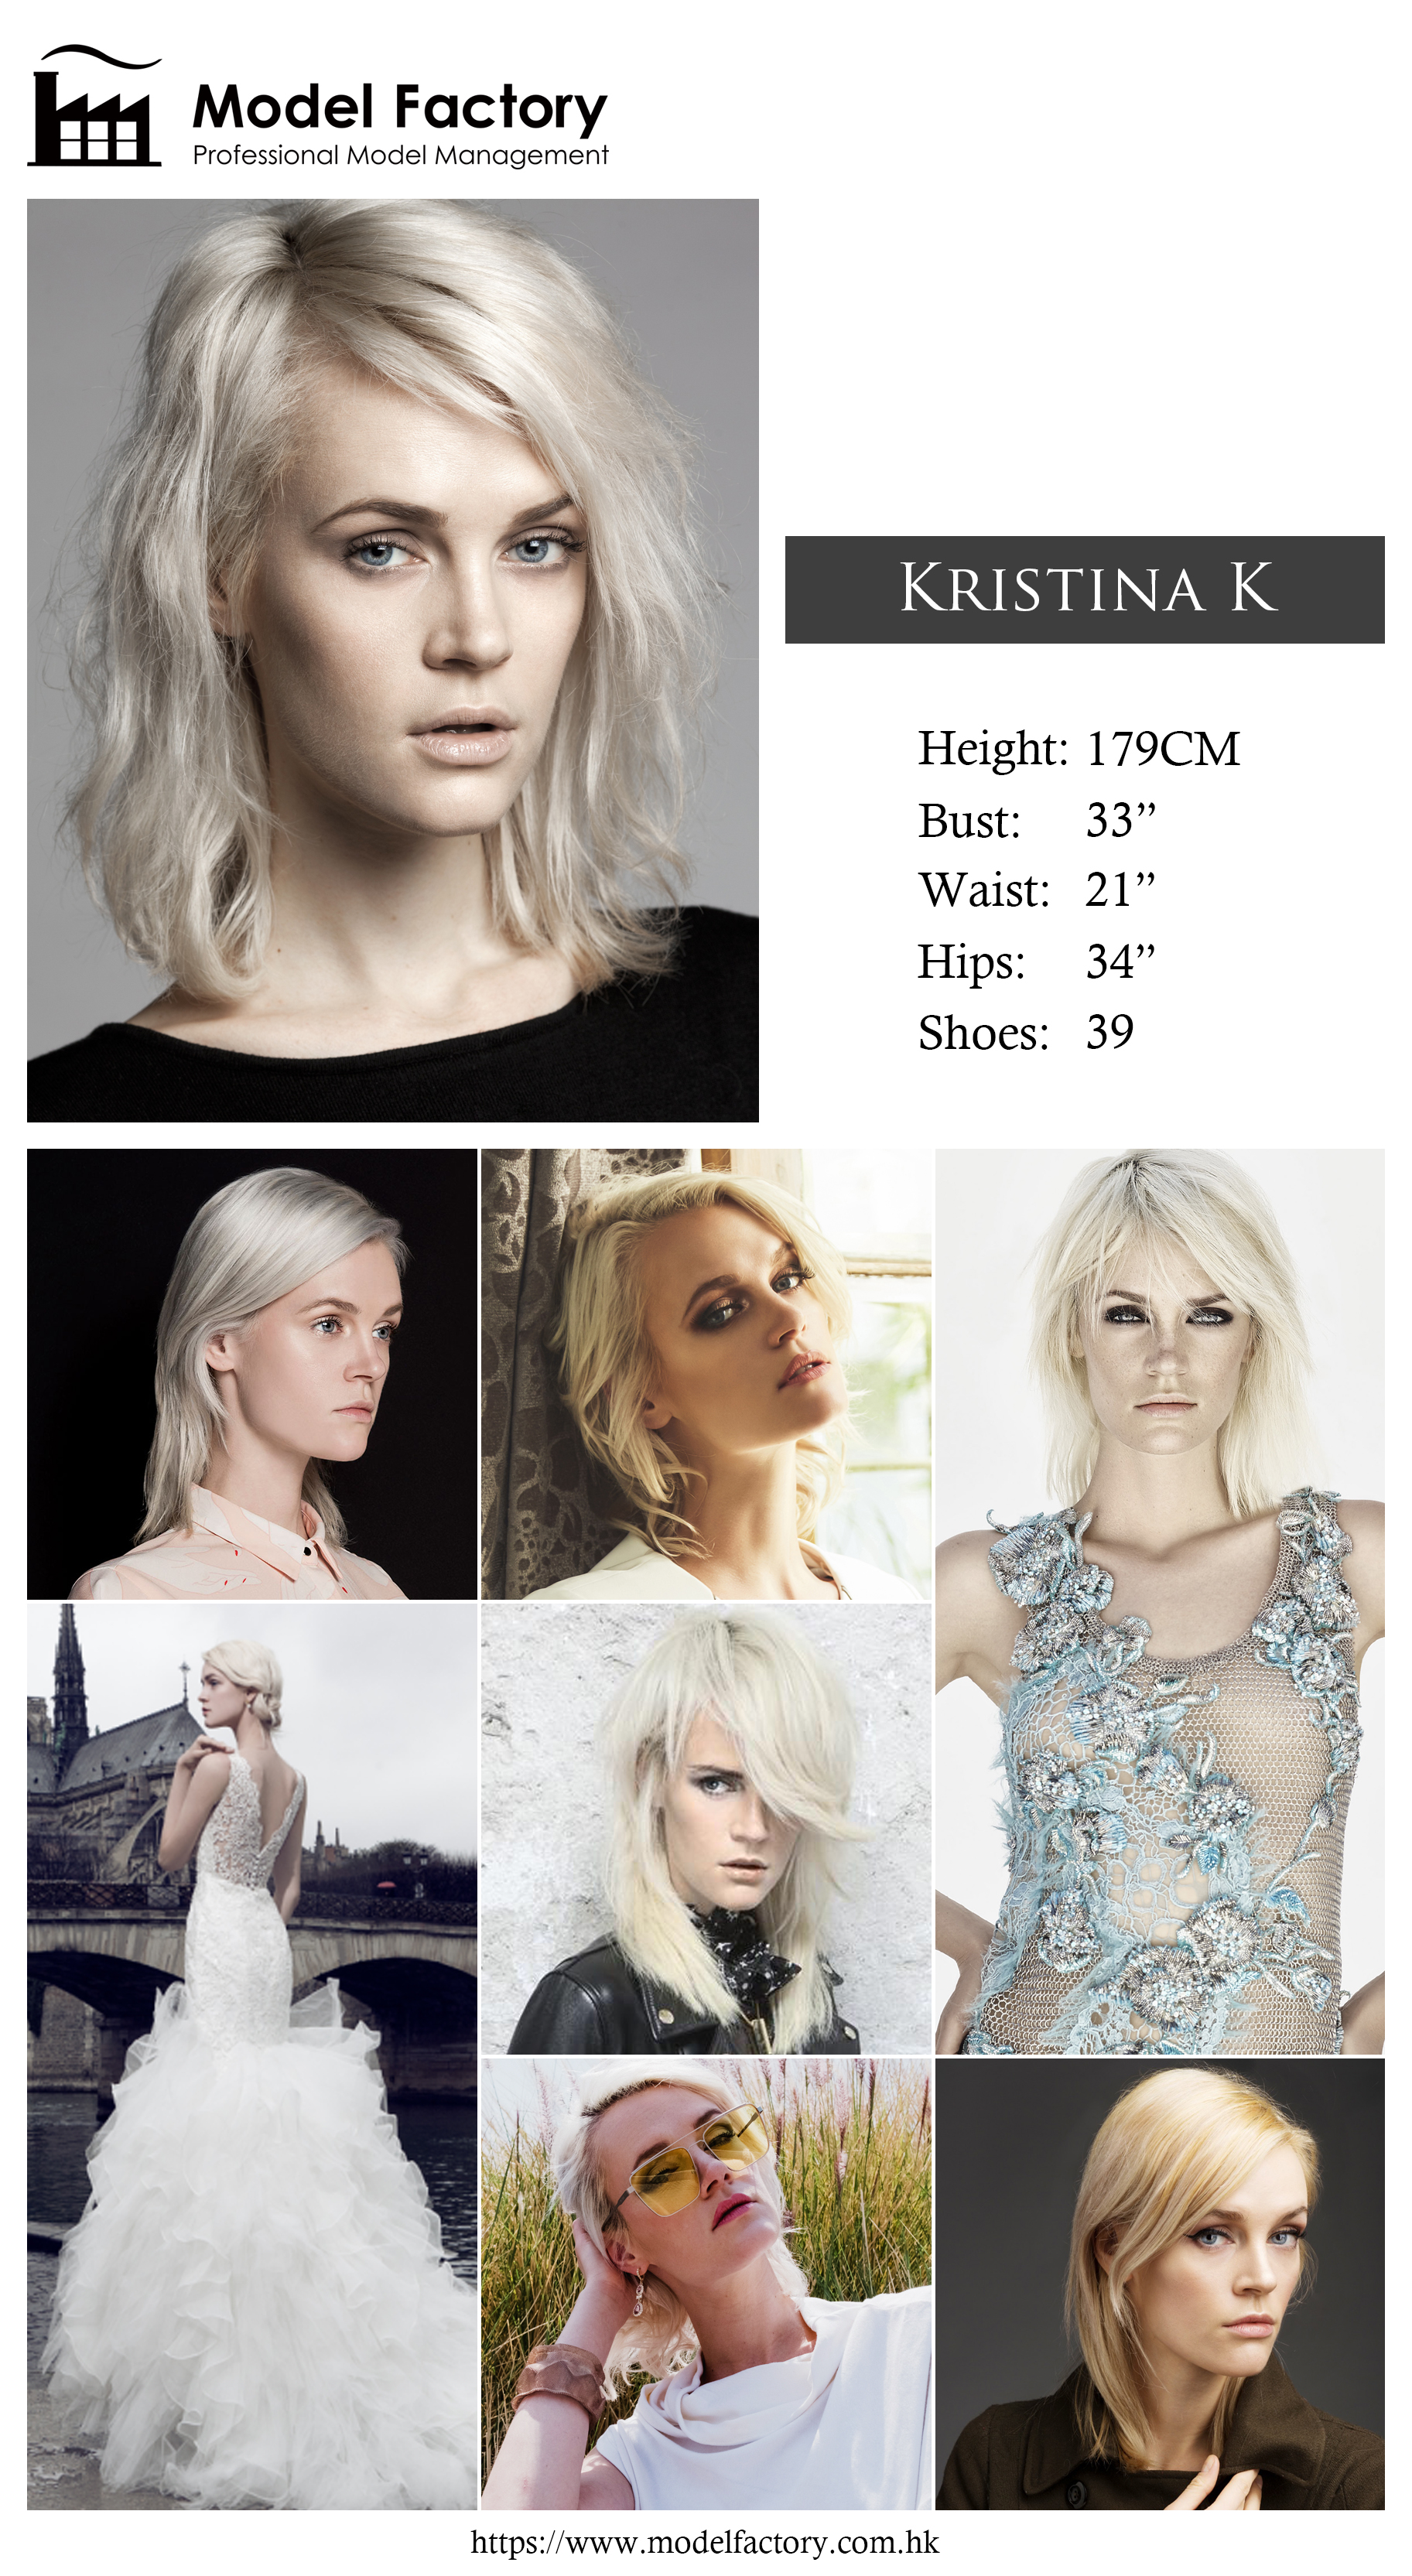 Model Factory Caucasian Female Model KristinaK